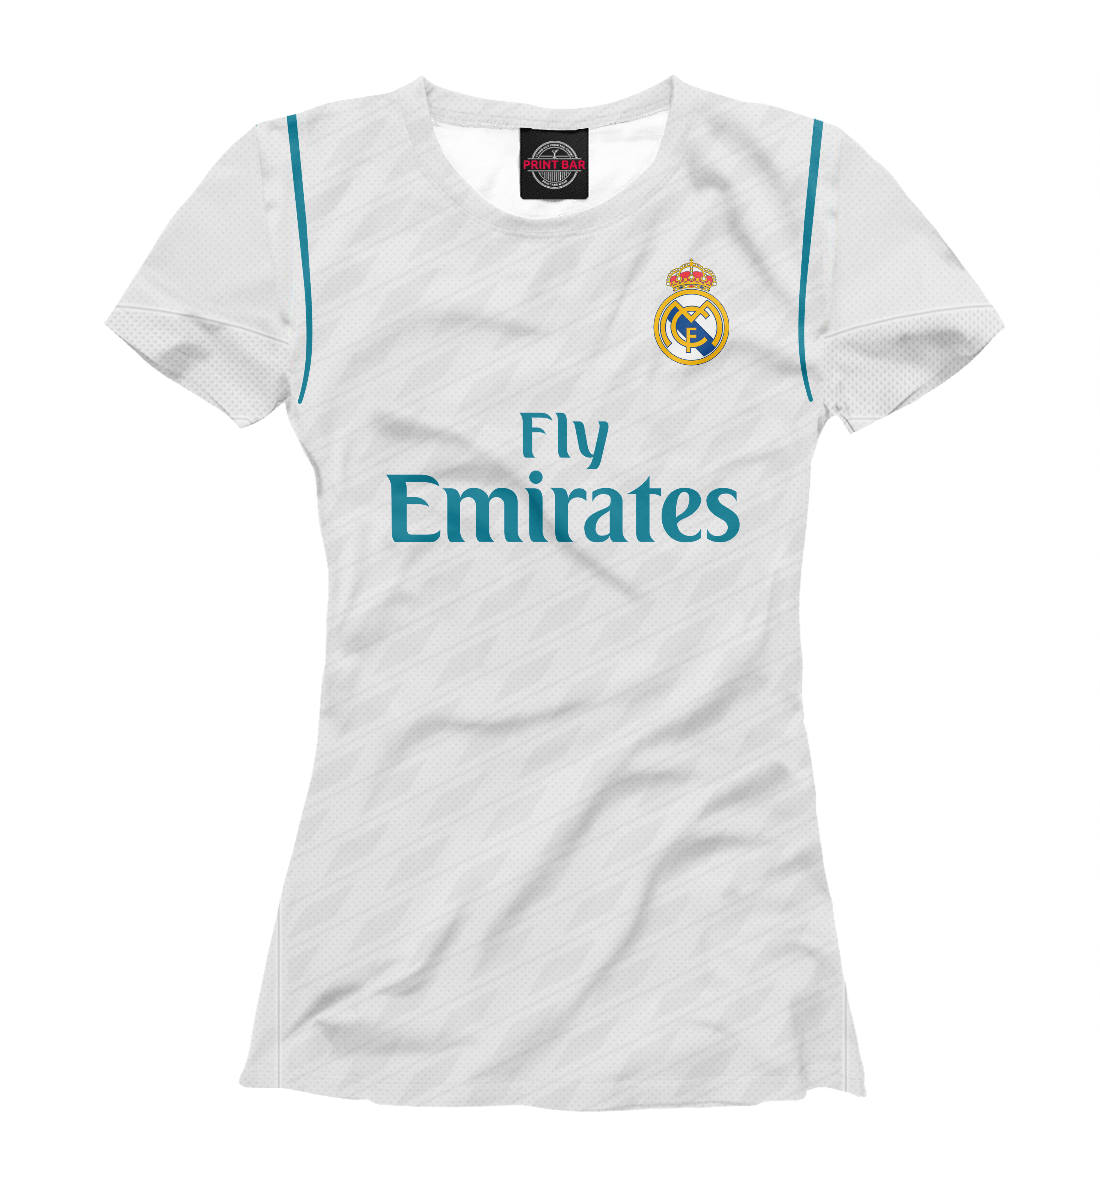 Купить Форма Реал Мадрид Домашняя 17/18, Printbar, Футболки, REA-977039-fut-1